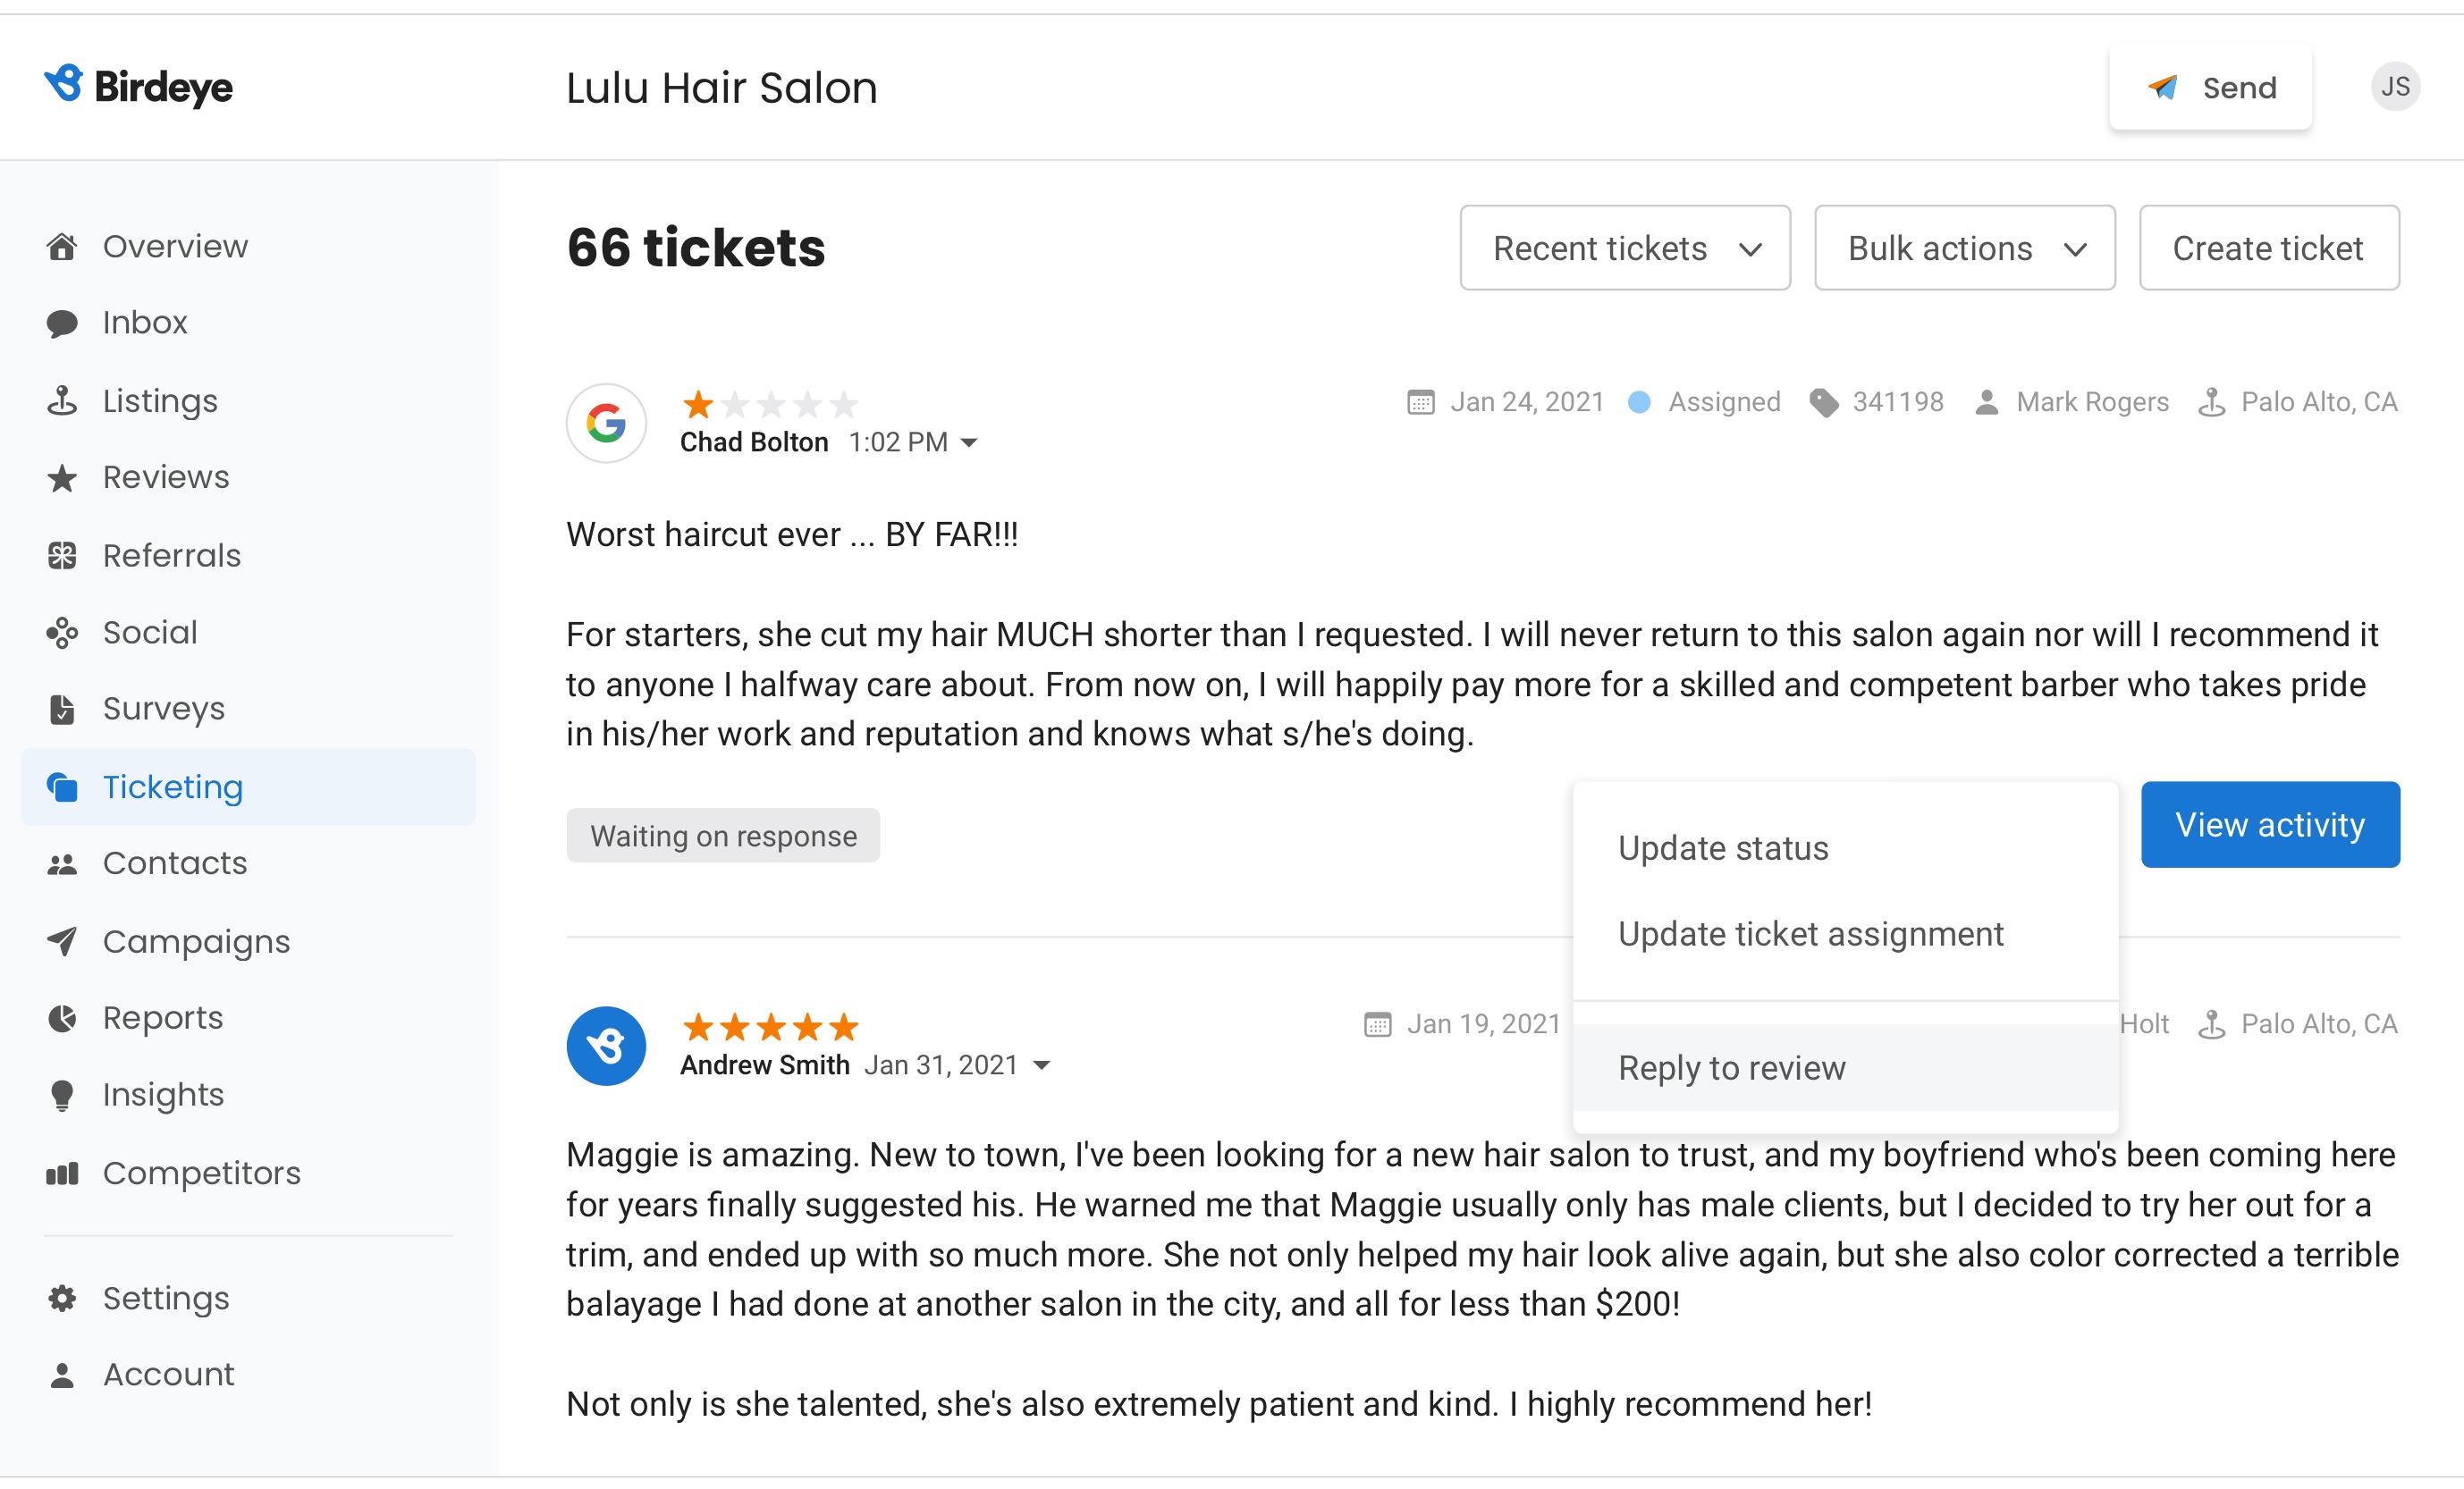 Birdeye Software - Birdeye turn negative feedback into tickets to take an immediate action